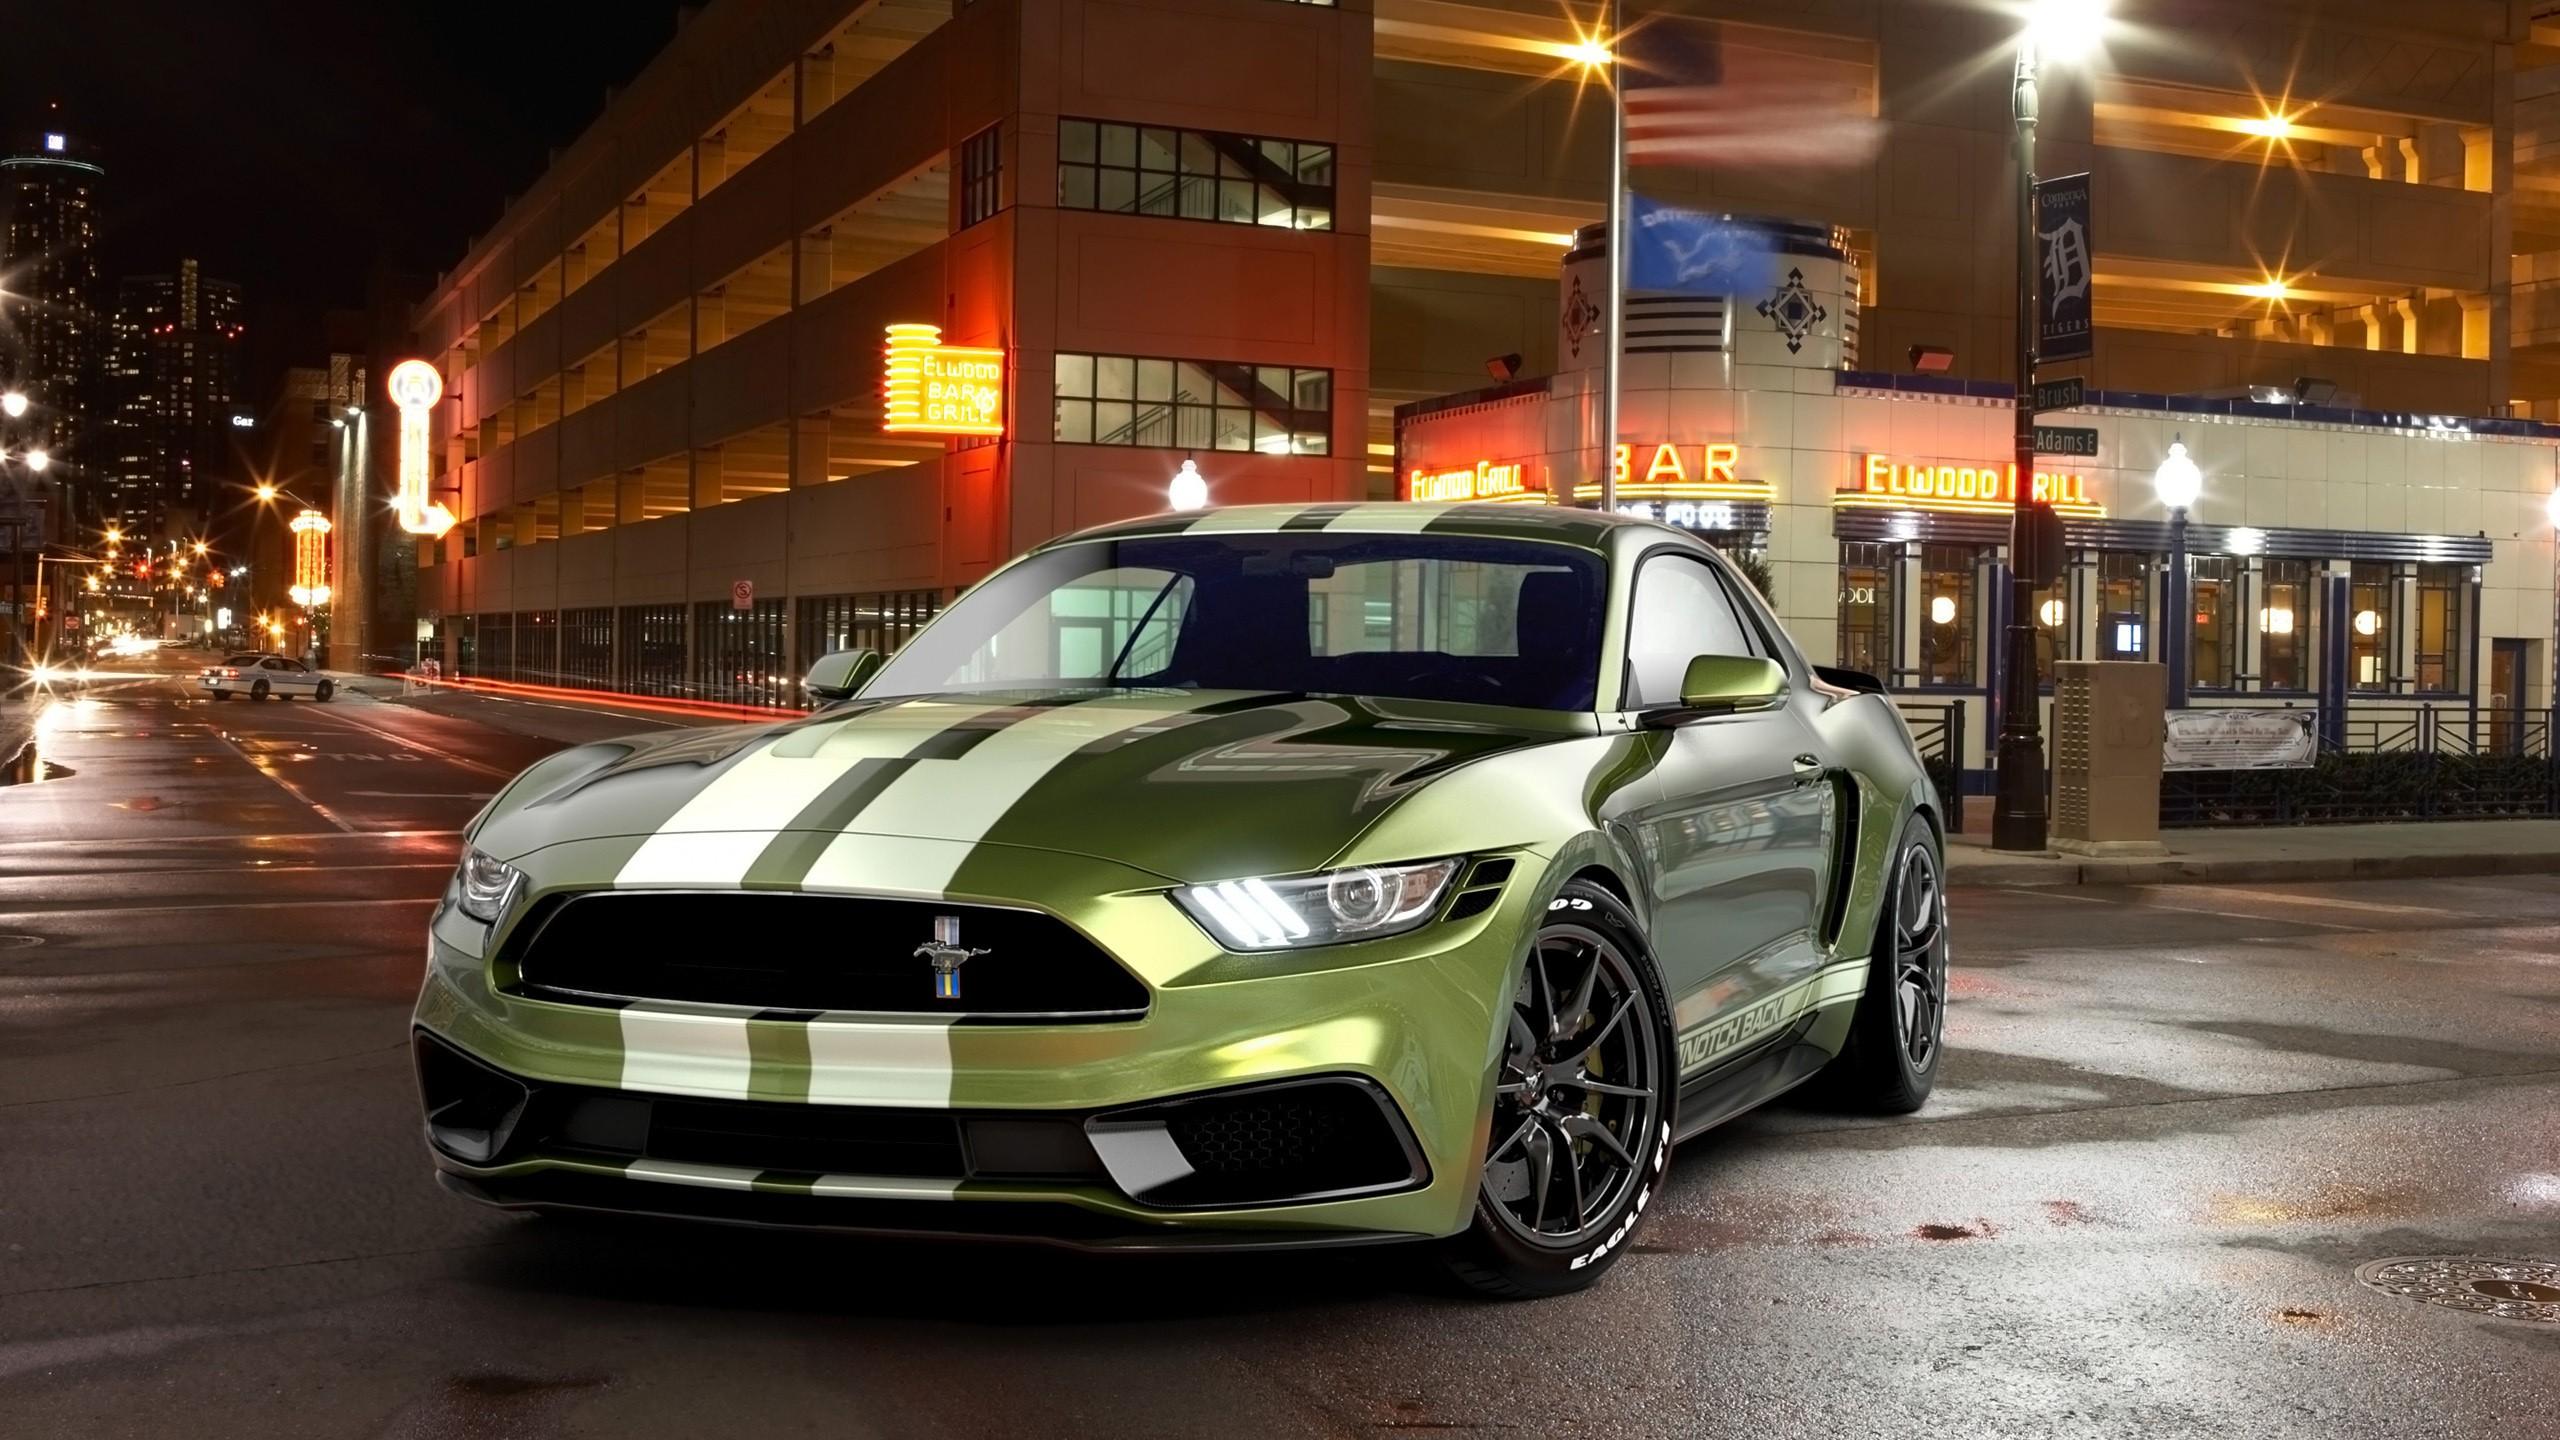 Ultra Hd Wallpapers 8k Cars Pack 2017 Ford Mustang Notchback Design Wallpaper Hd Car